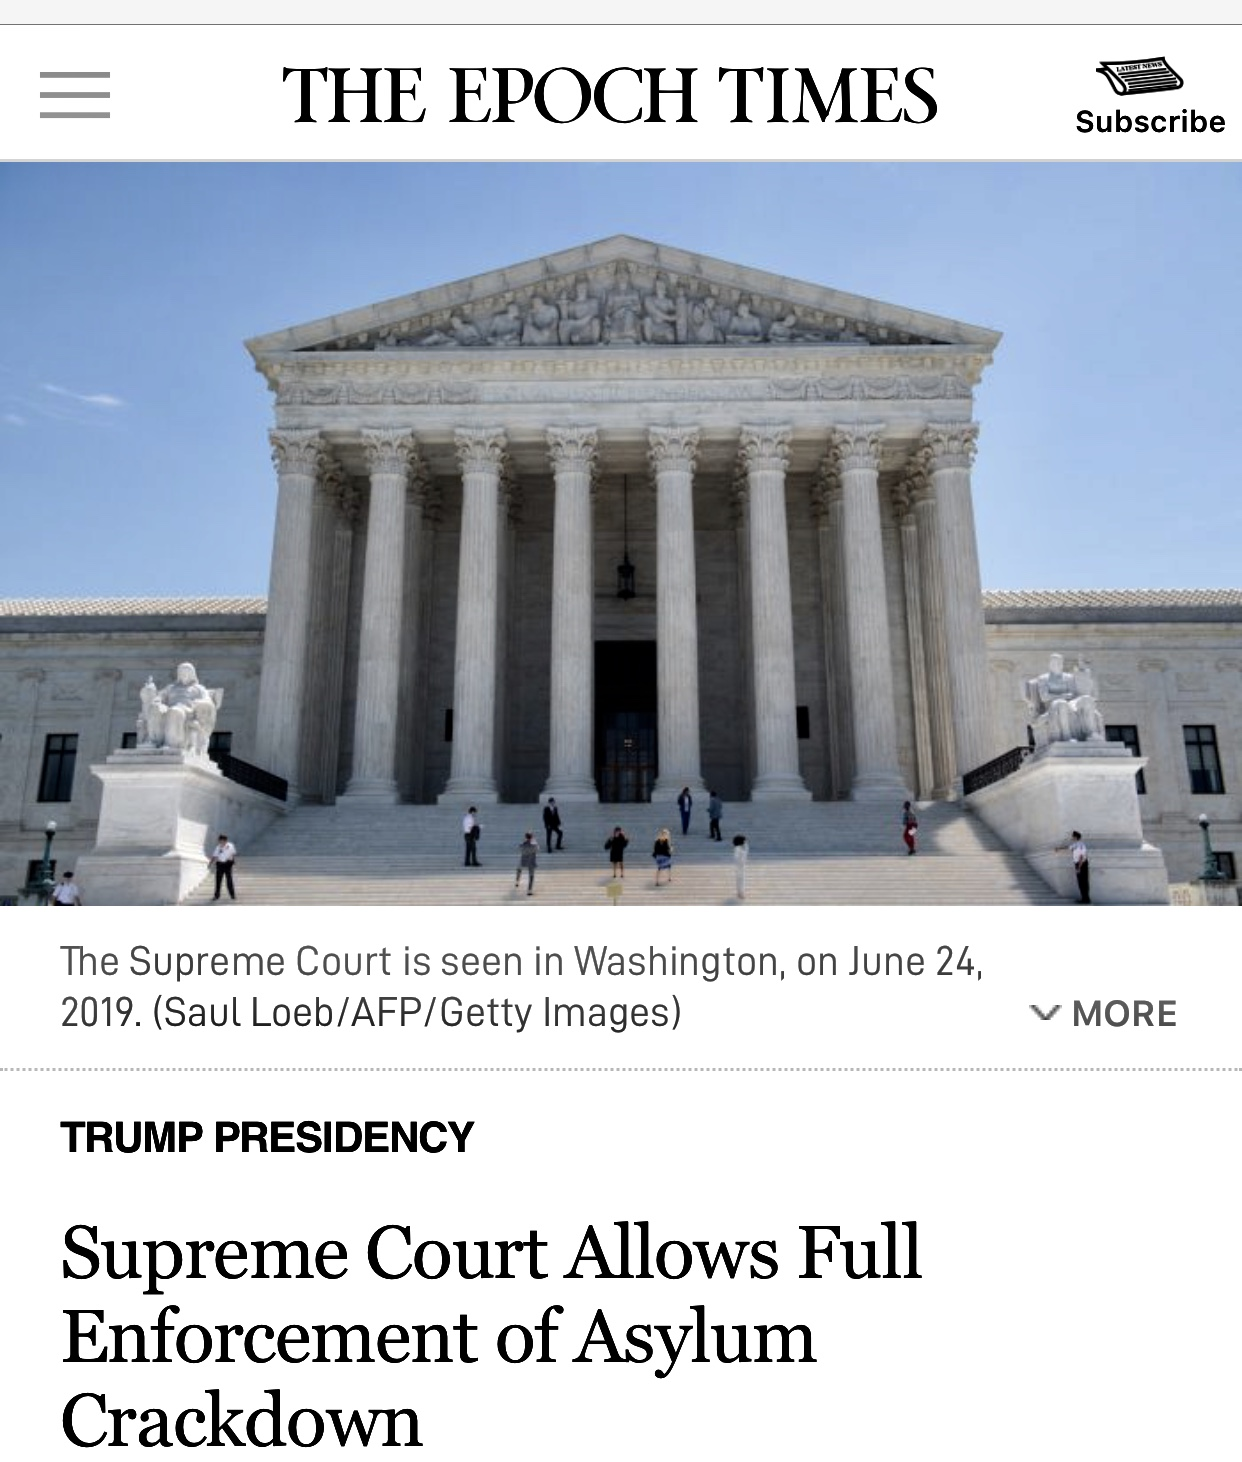 Supreme Court Allows Full Enforcement of Asylum Crackdown